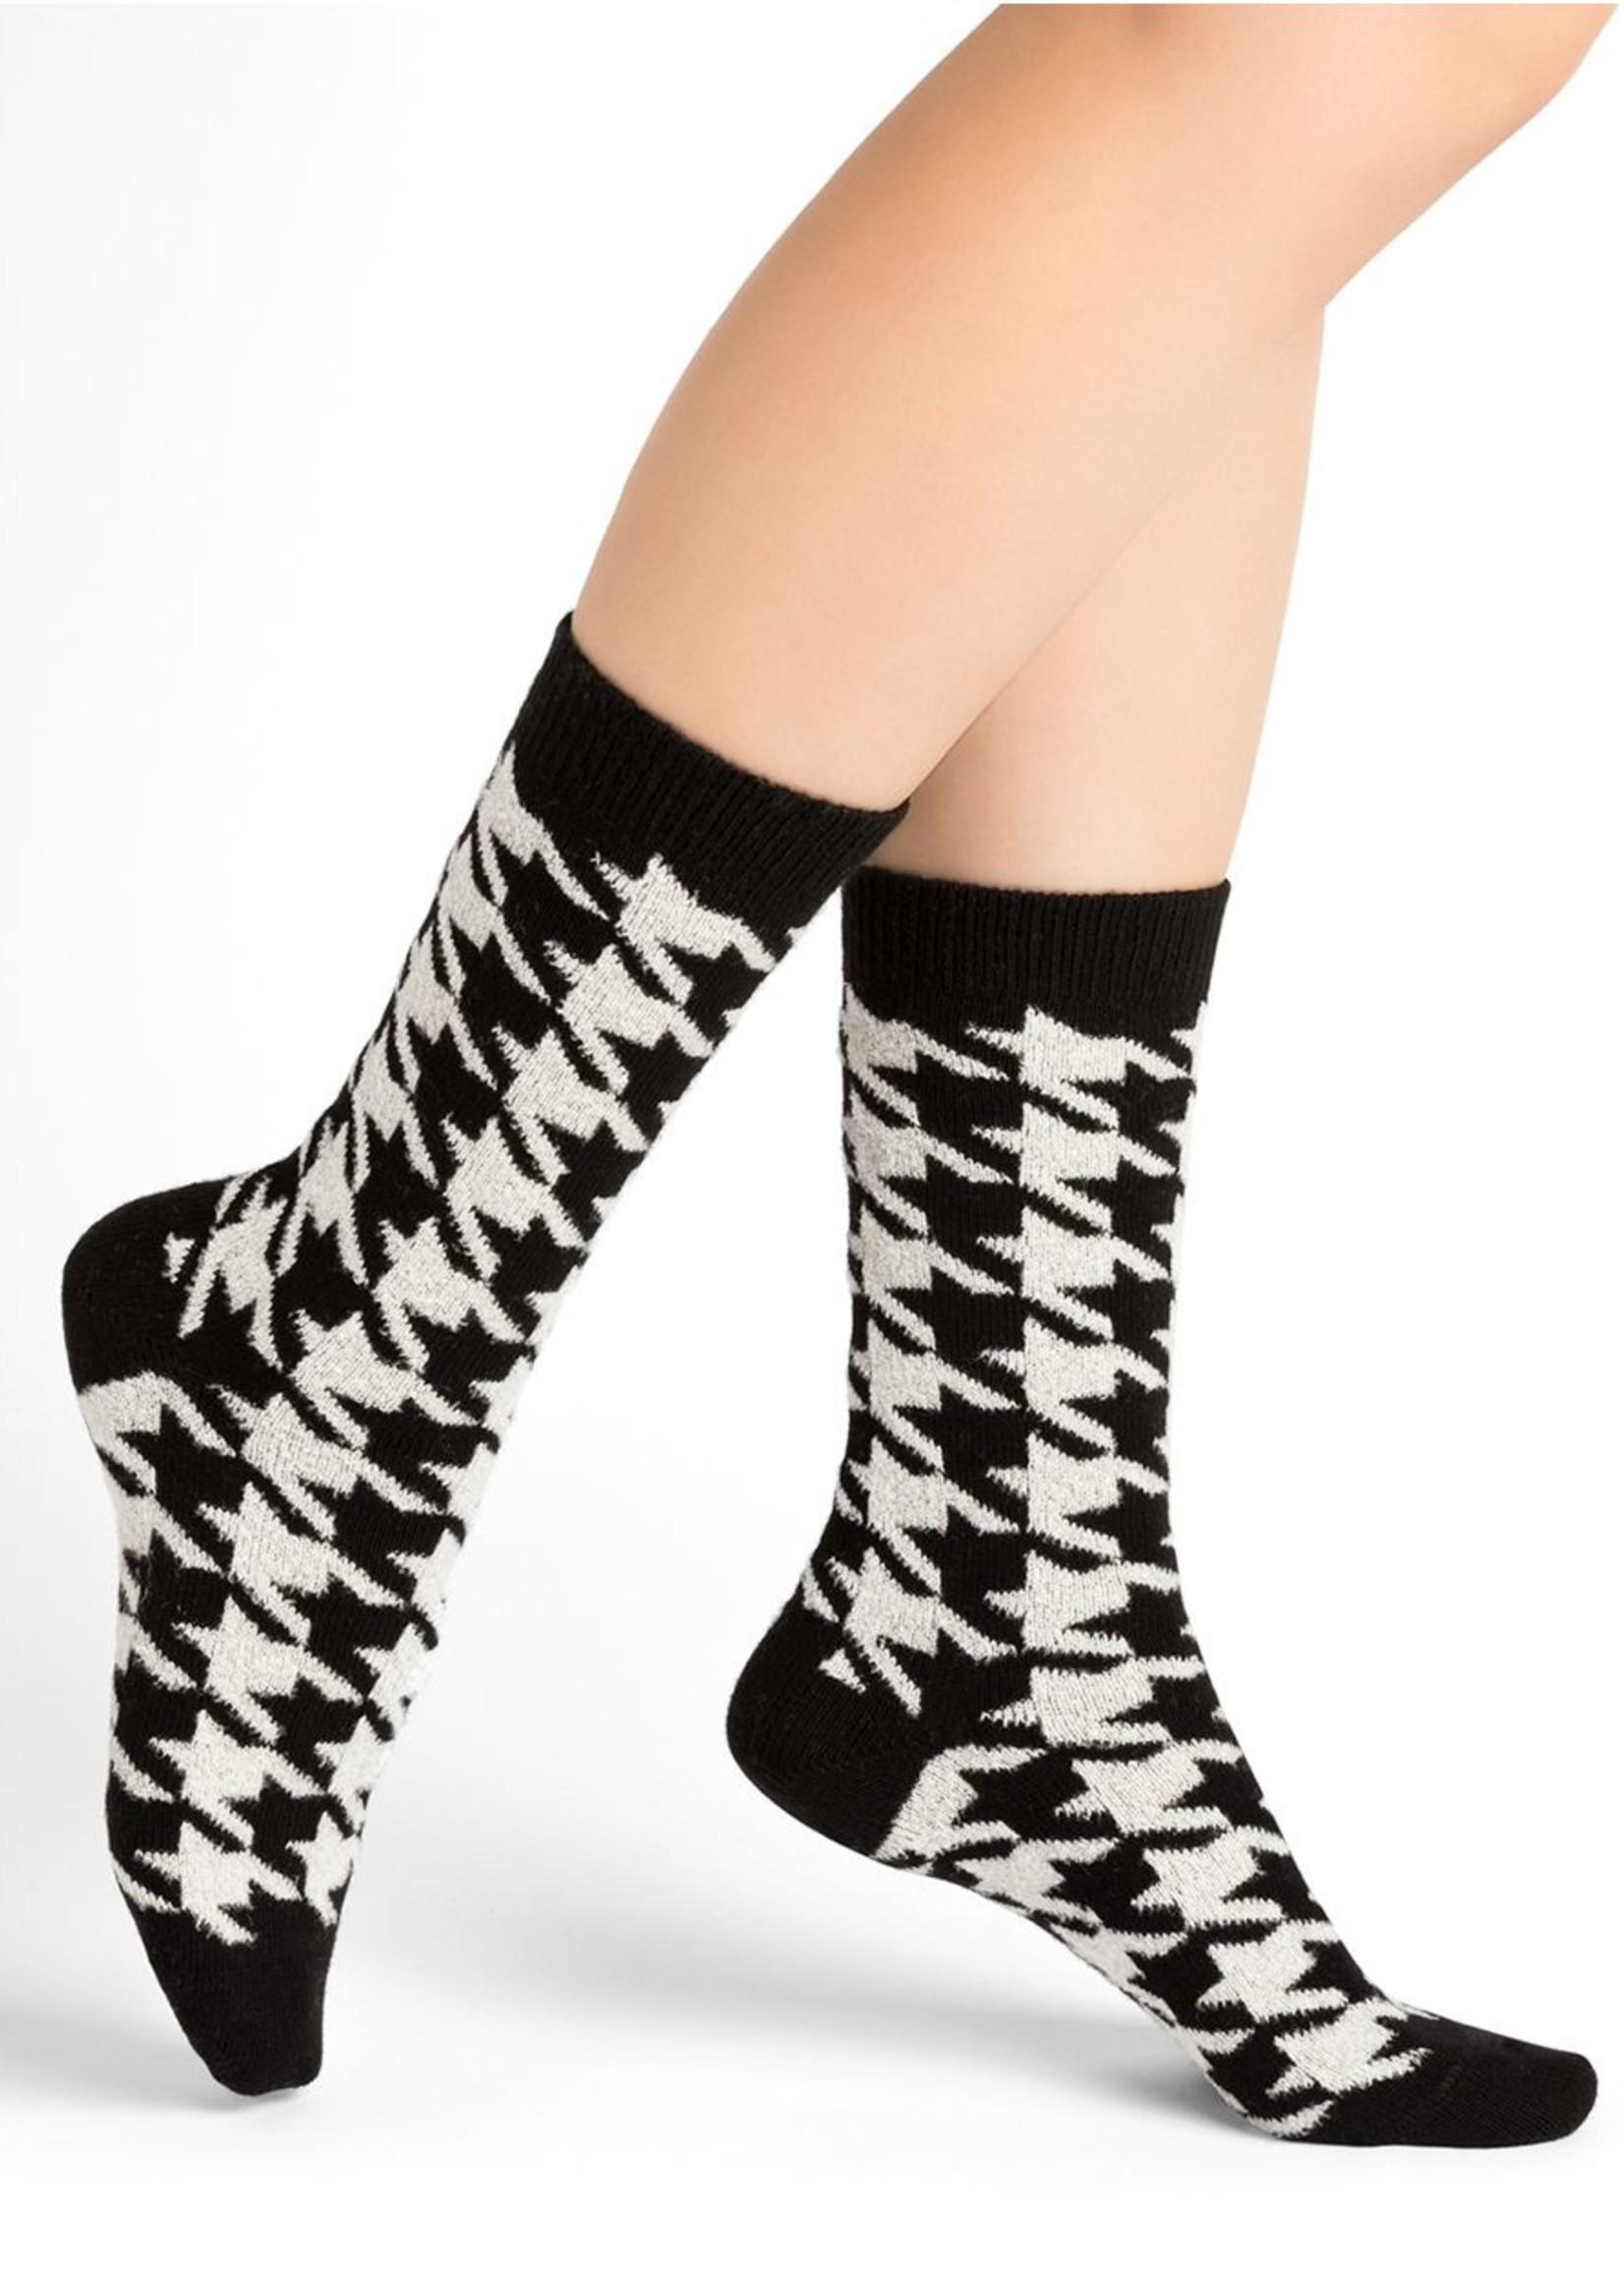 Bleuforet Houndstooth Cashmere Socks